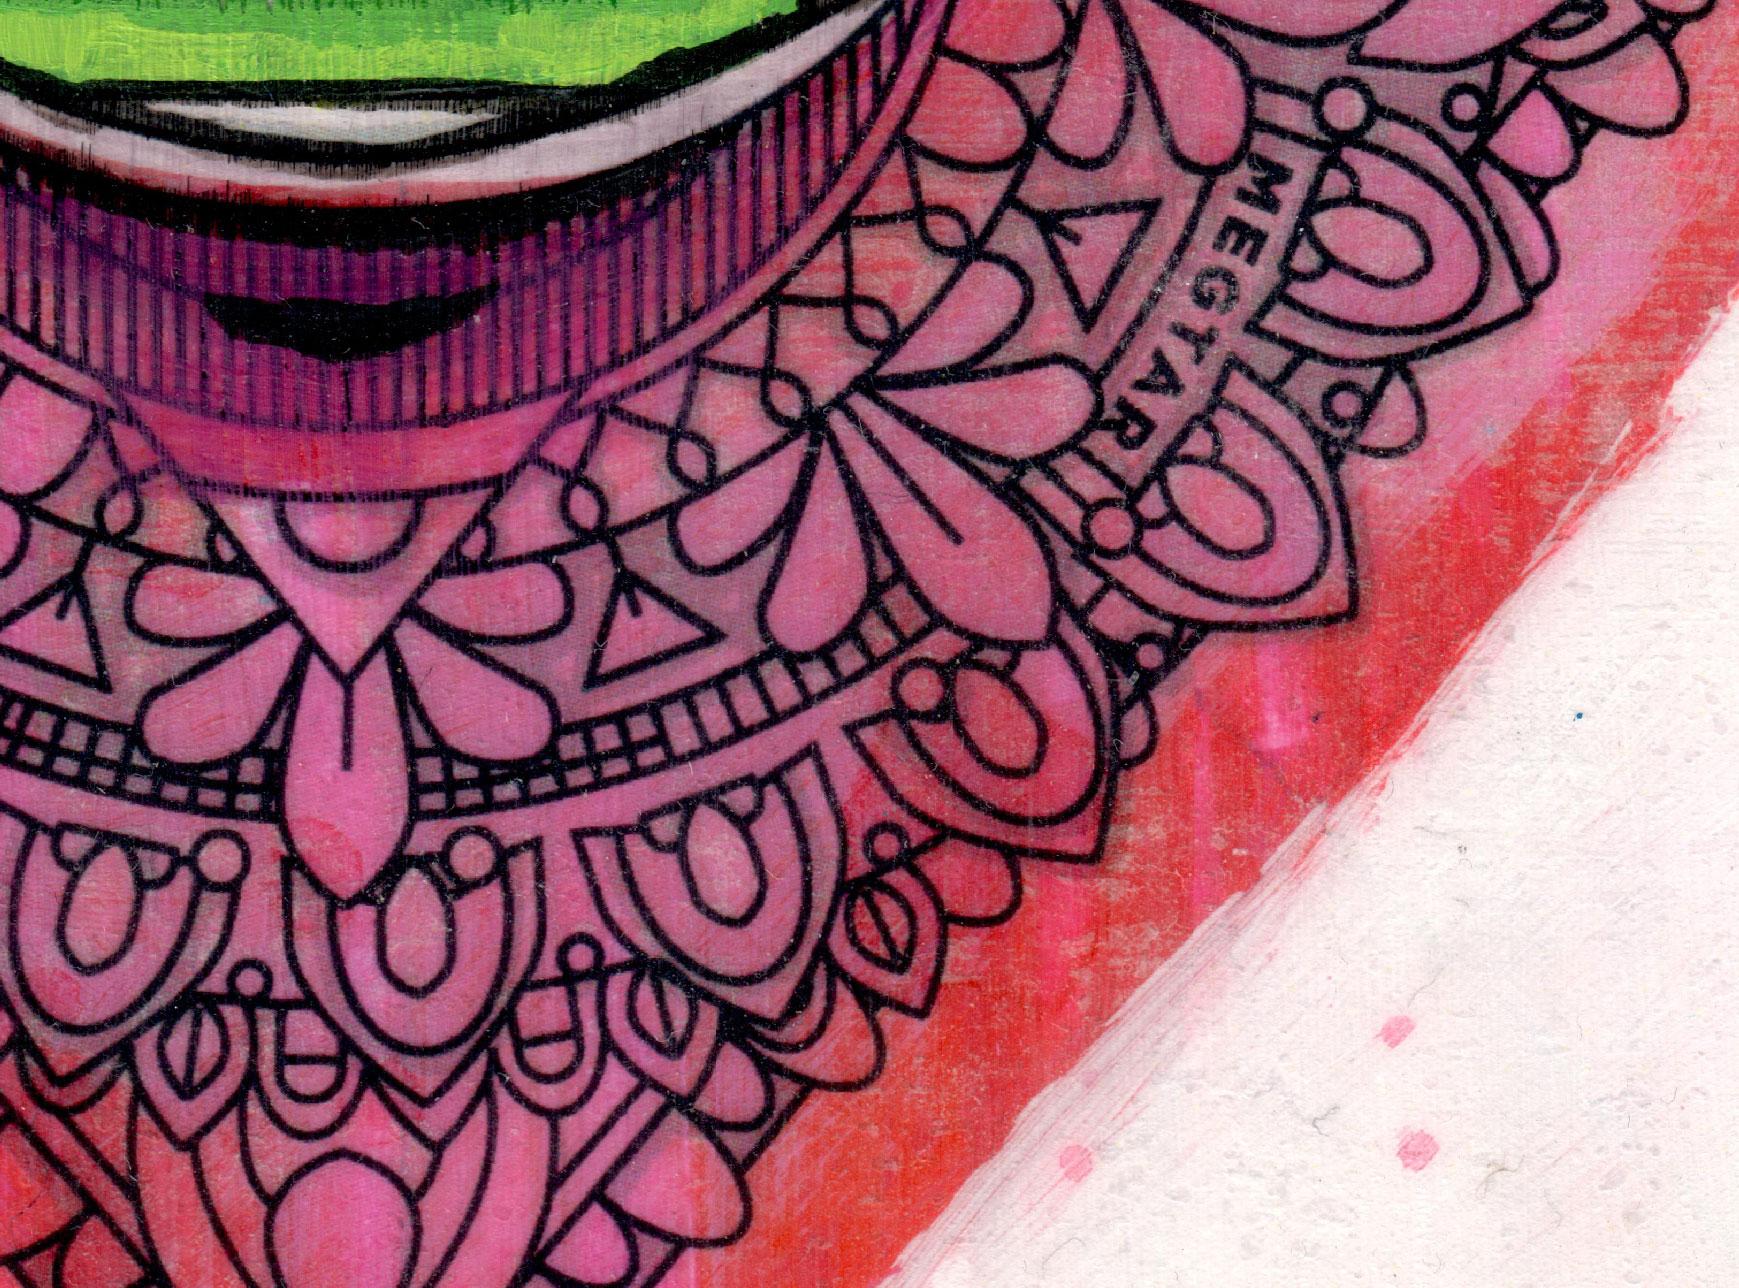 VisumEstBonum#2-Painting_Detail3.jpg